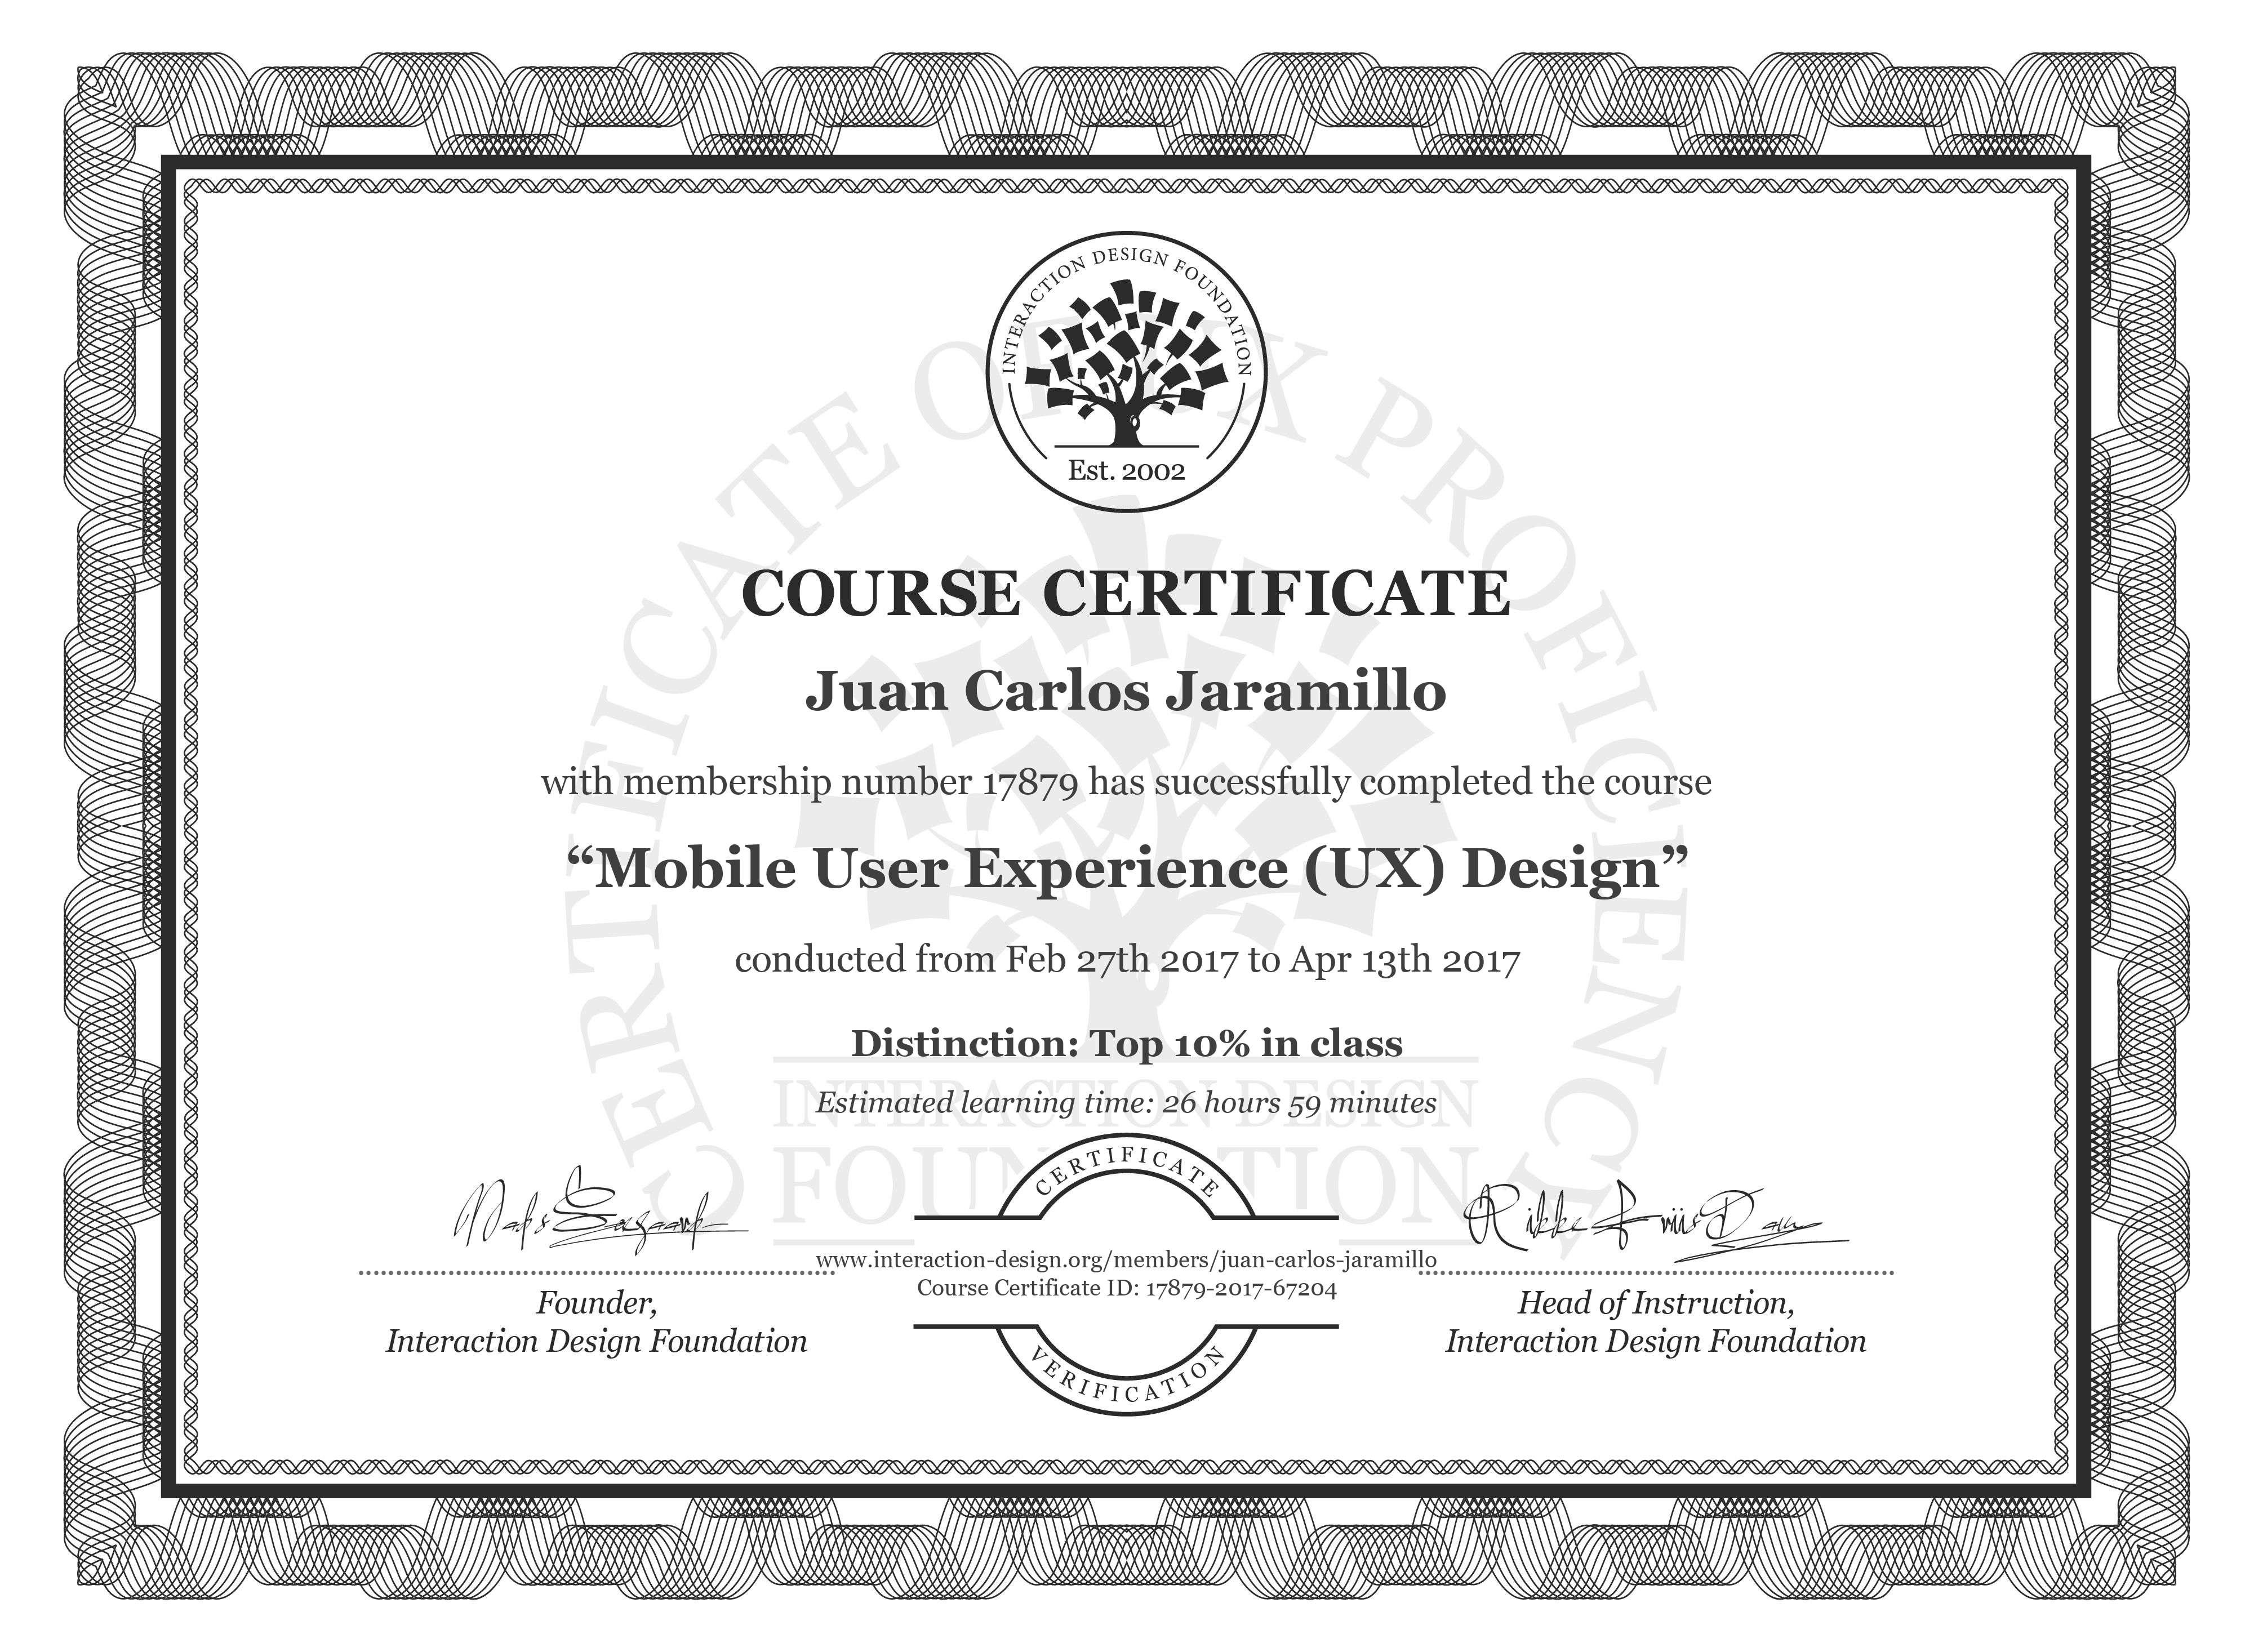 Juan Carlos Jaramillo: Course Certificate - Mobile User Experience (UX) Design